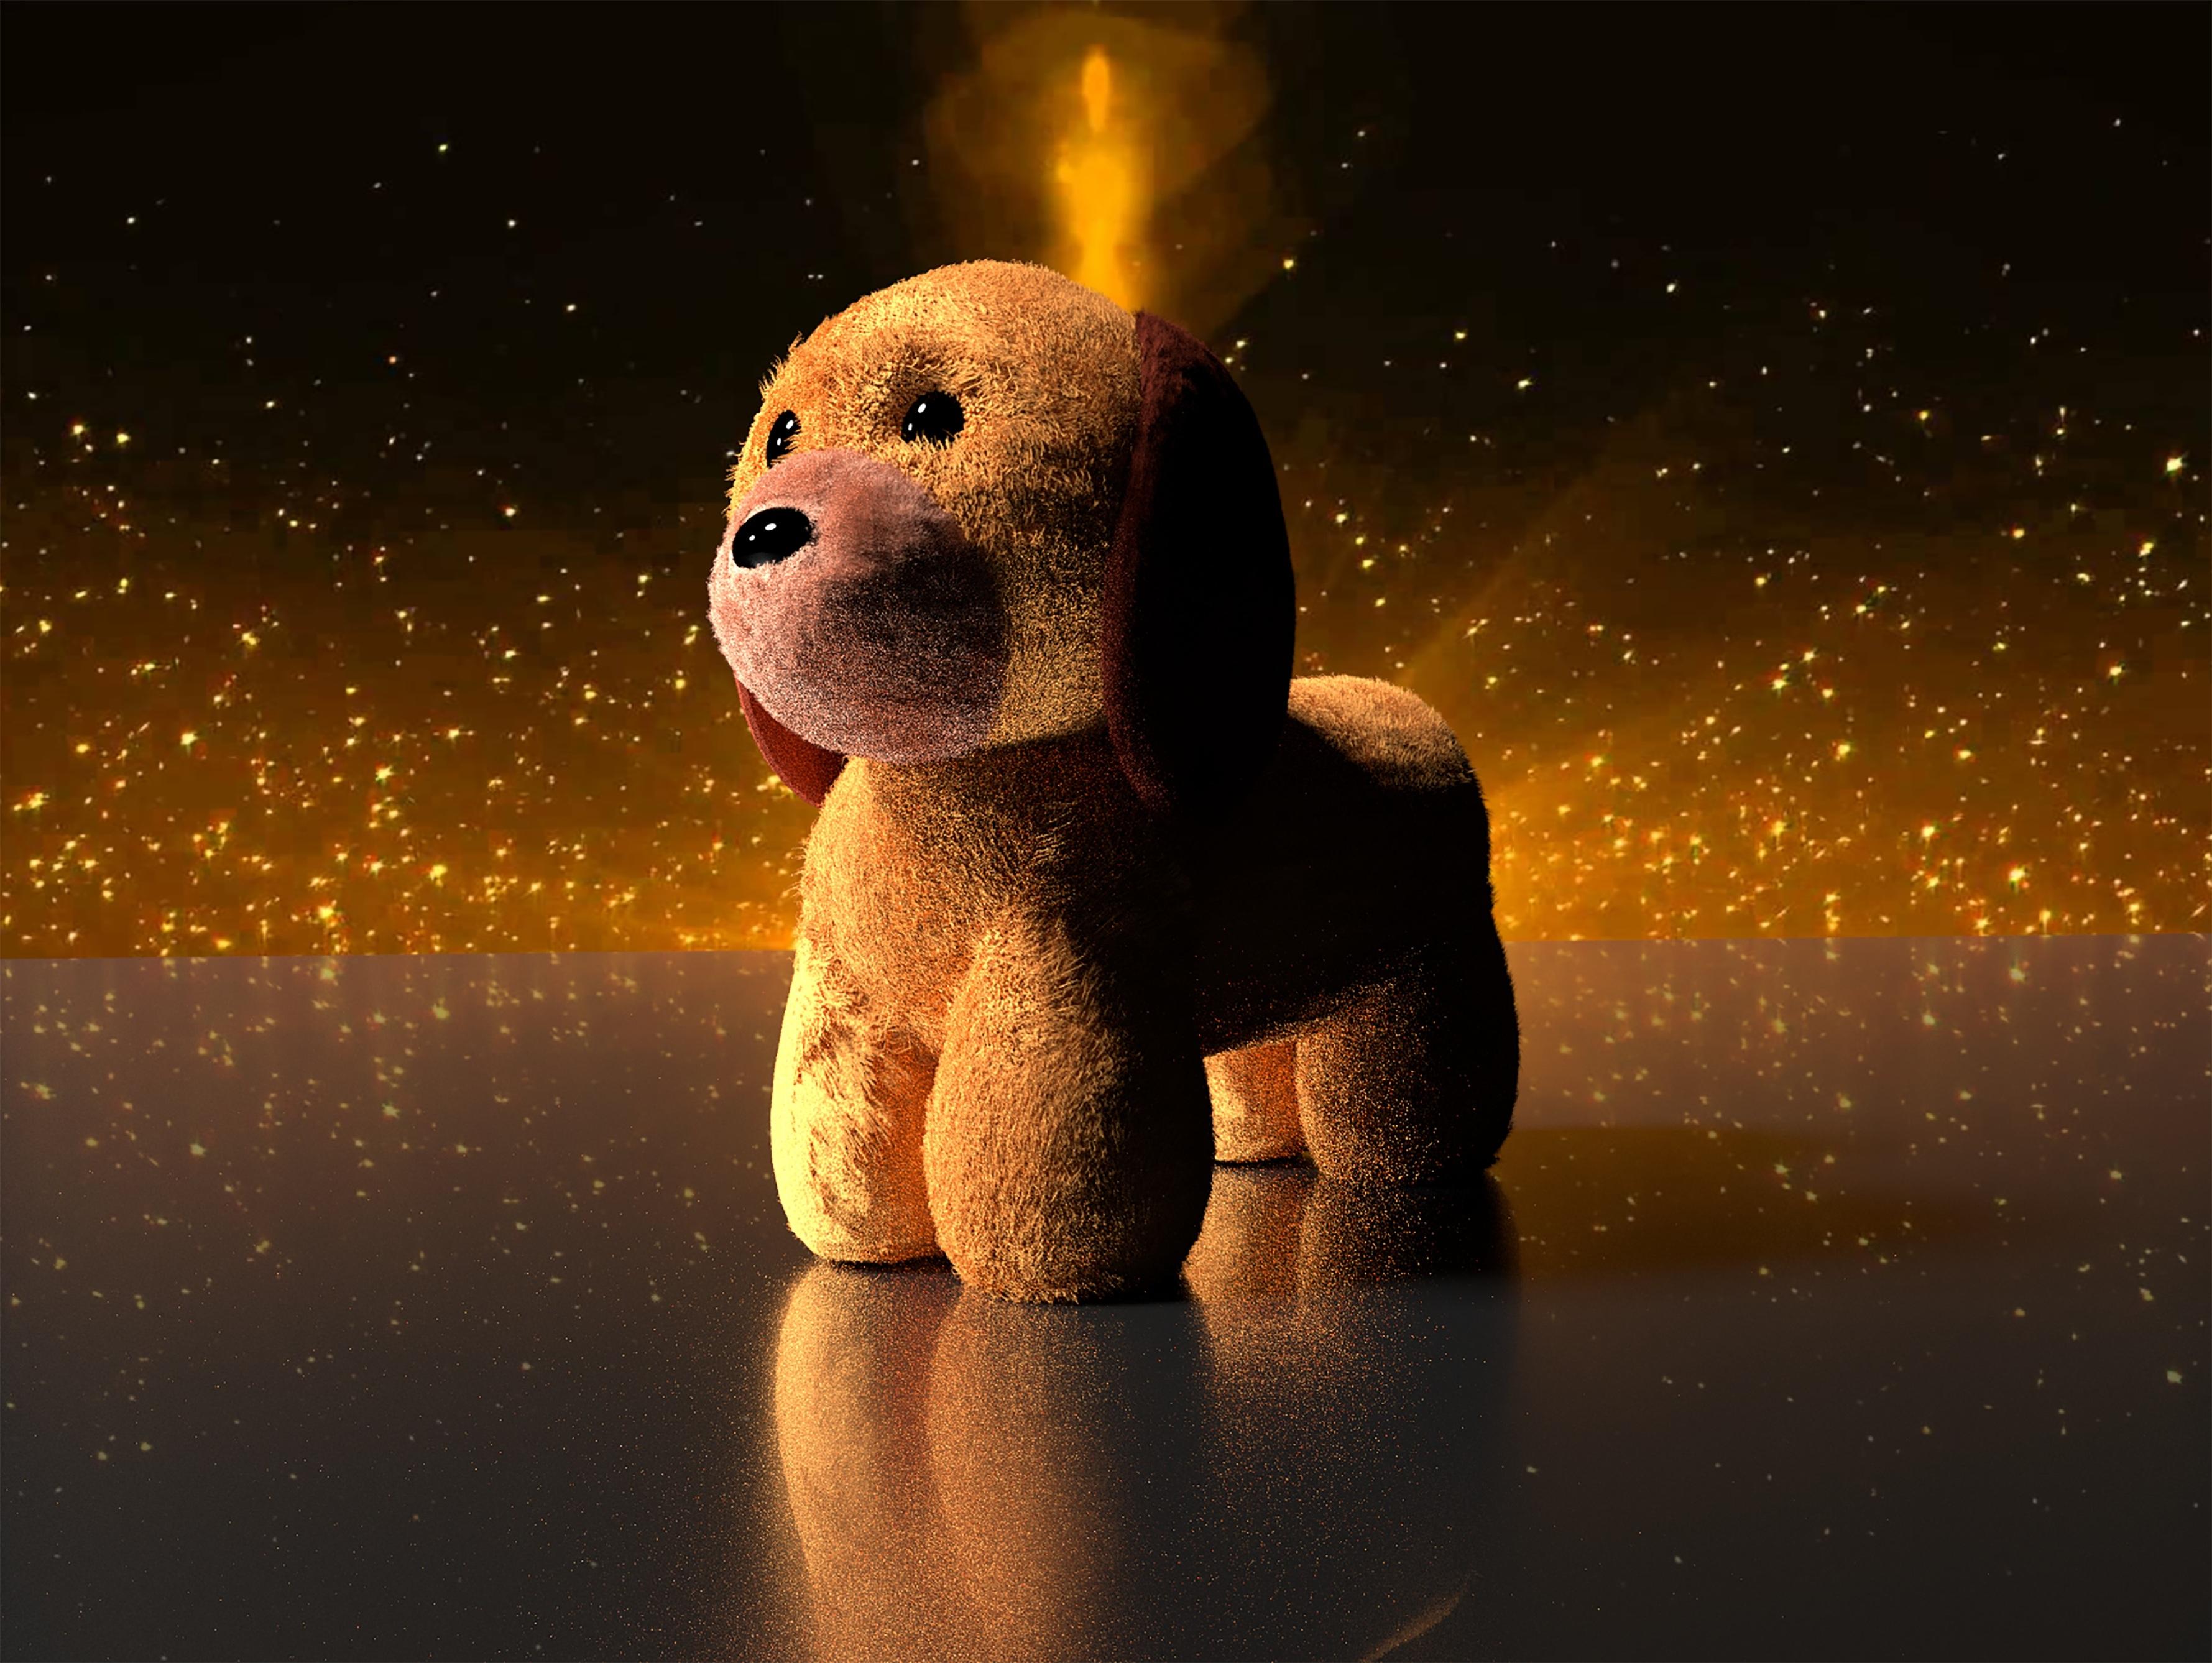 Gambar Malam Anak Anjing Hewan Ruang Coklat Kegelapan